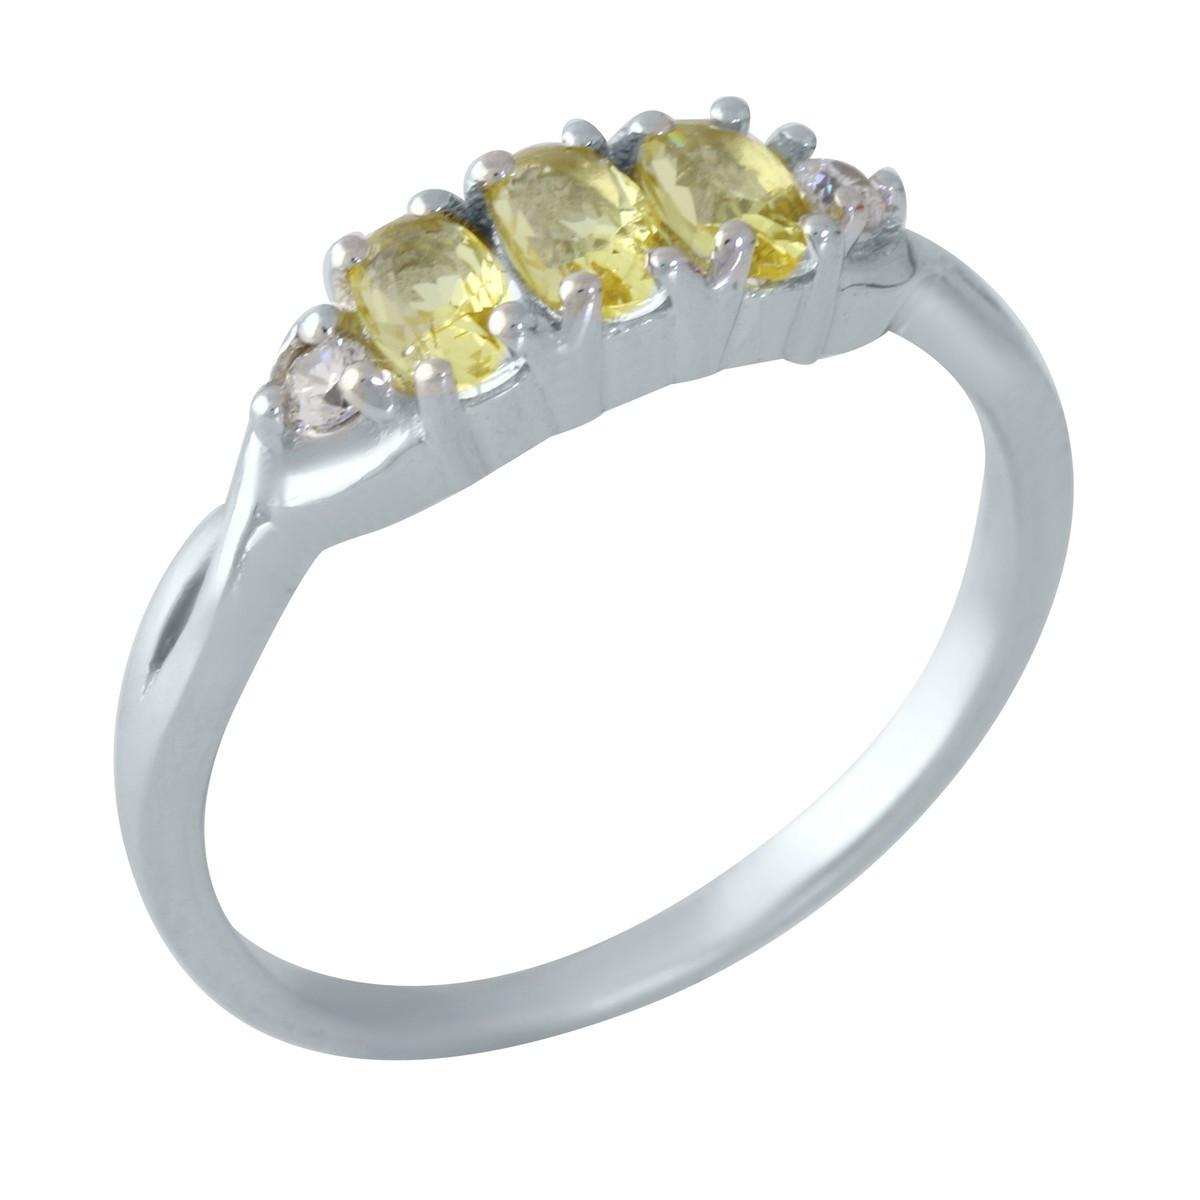 Серебряное кольцо DreamJewelry с цитрином nano (1957639) 17 размер